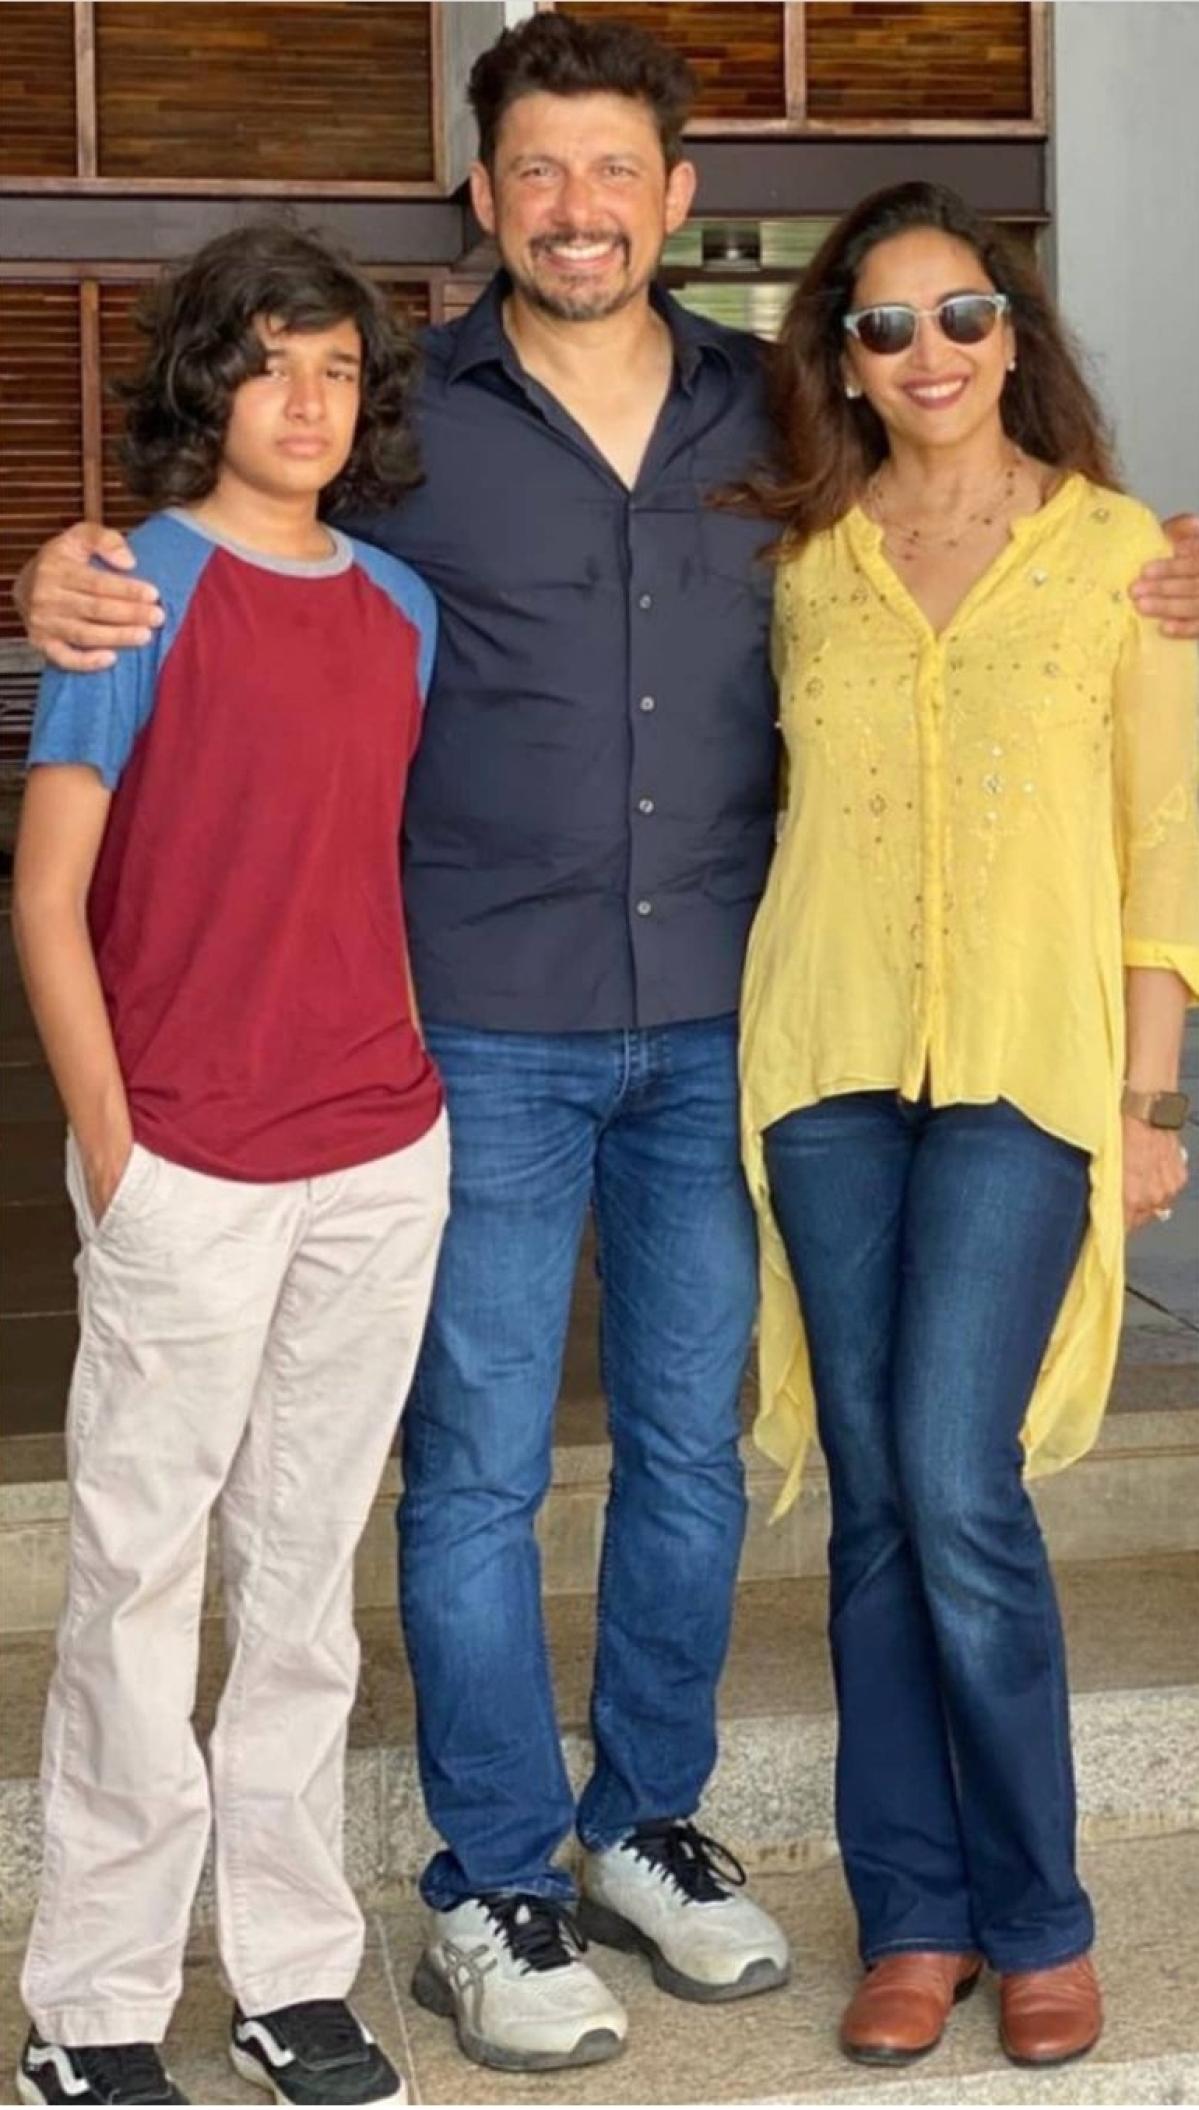 Madhuri and Madhav with their son Ryan